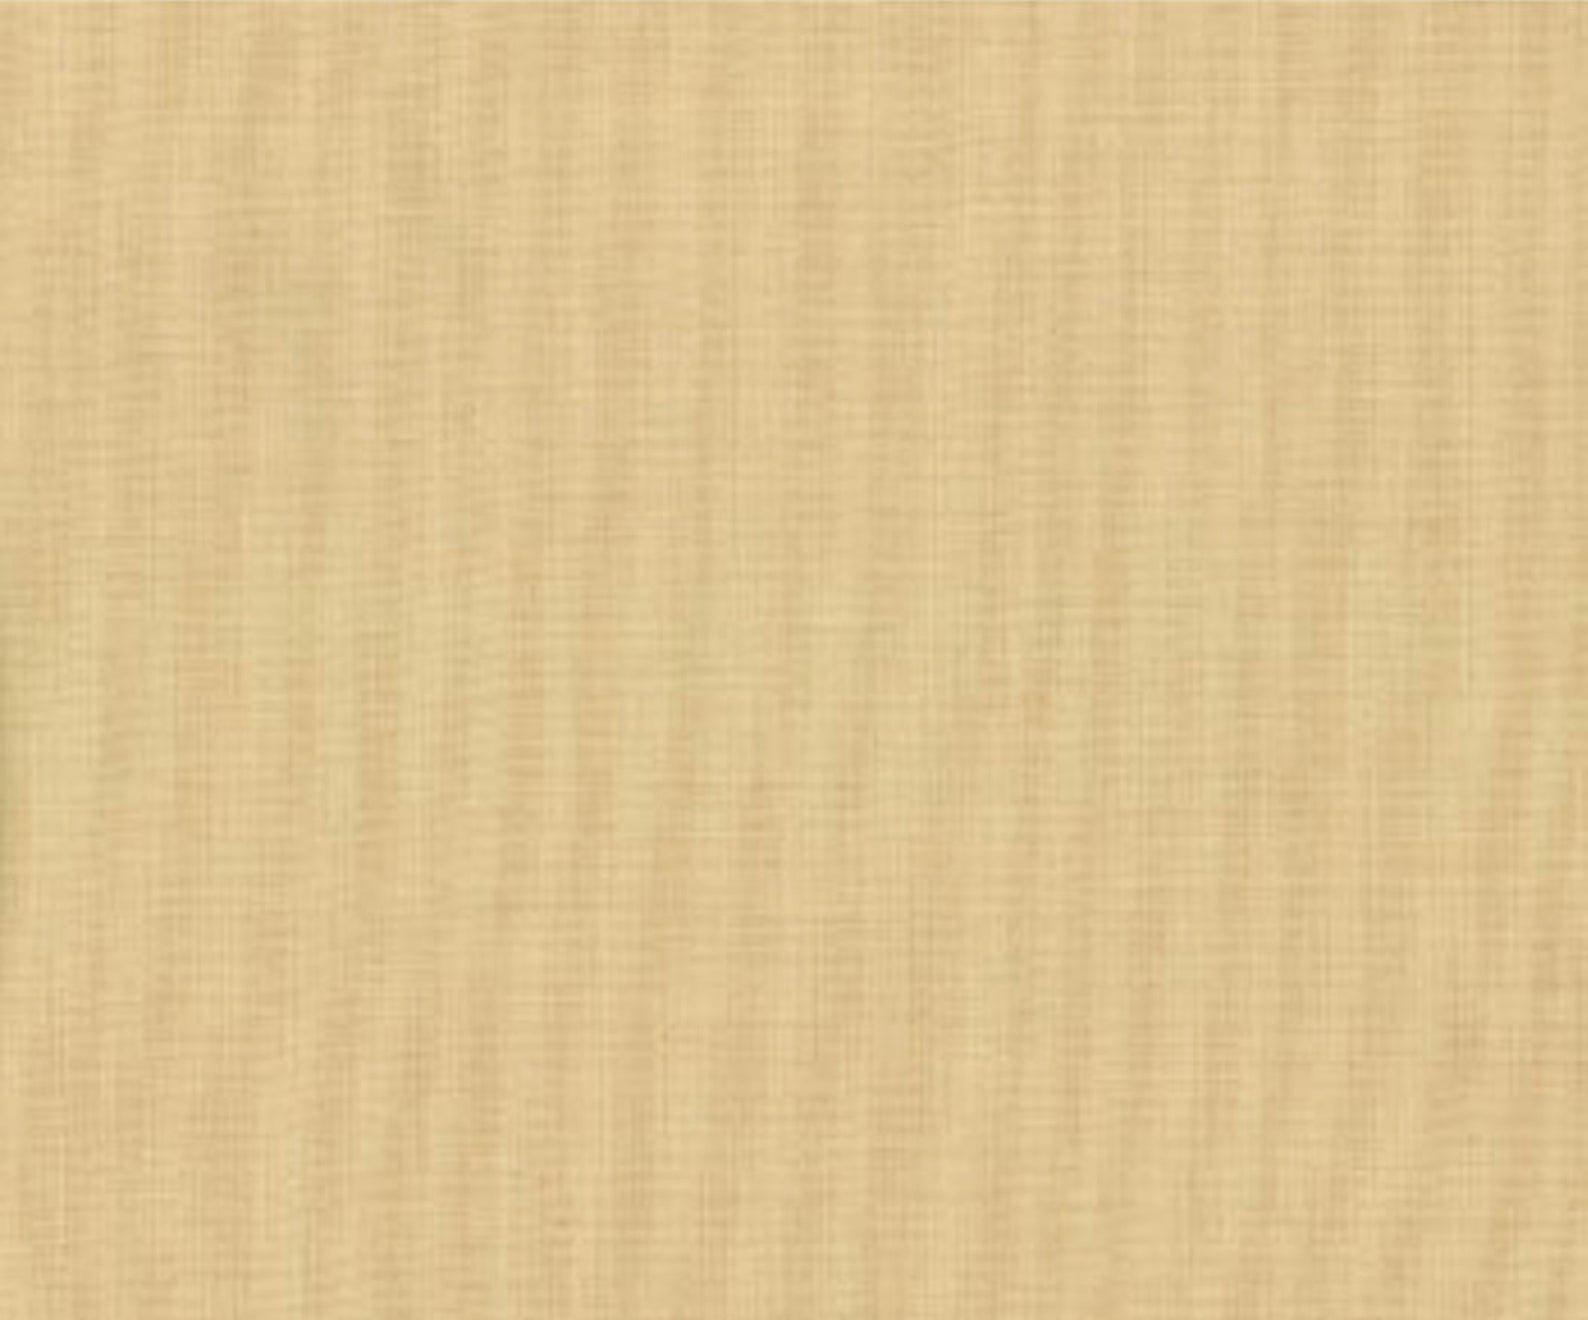 Bella Solids by Moda (9900-13 tan)